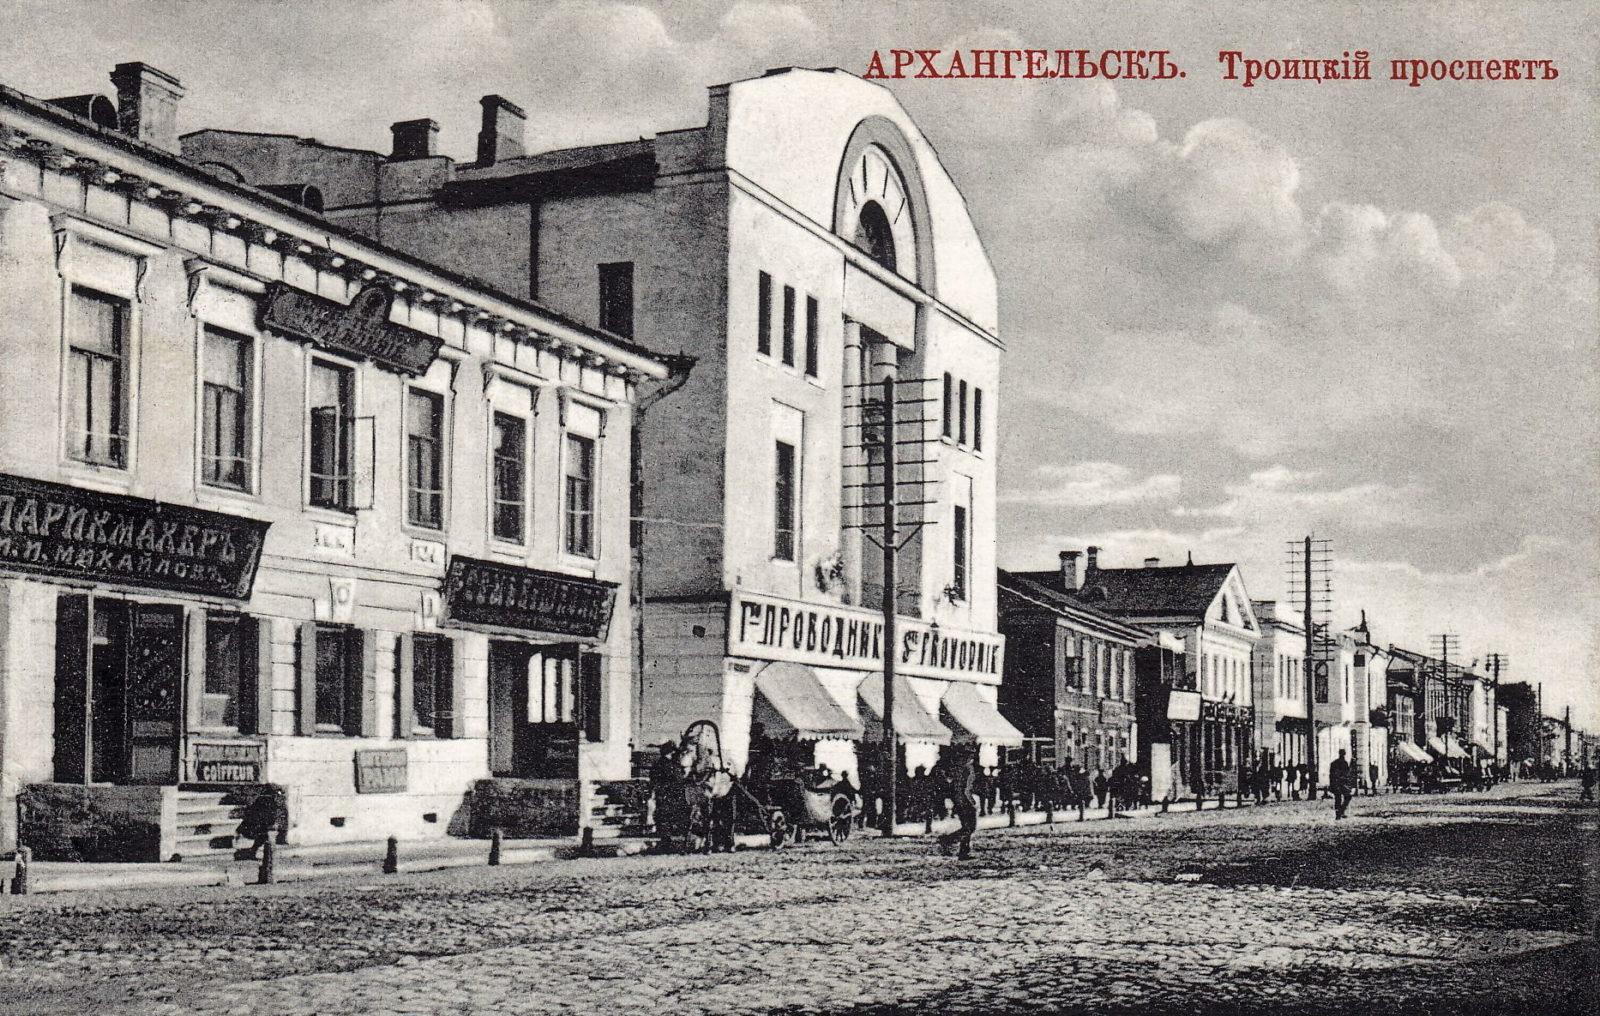 Troitskiy prospekt, Arkhangelsk (Archangel)